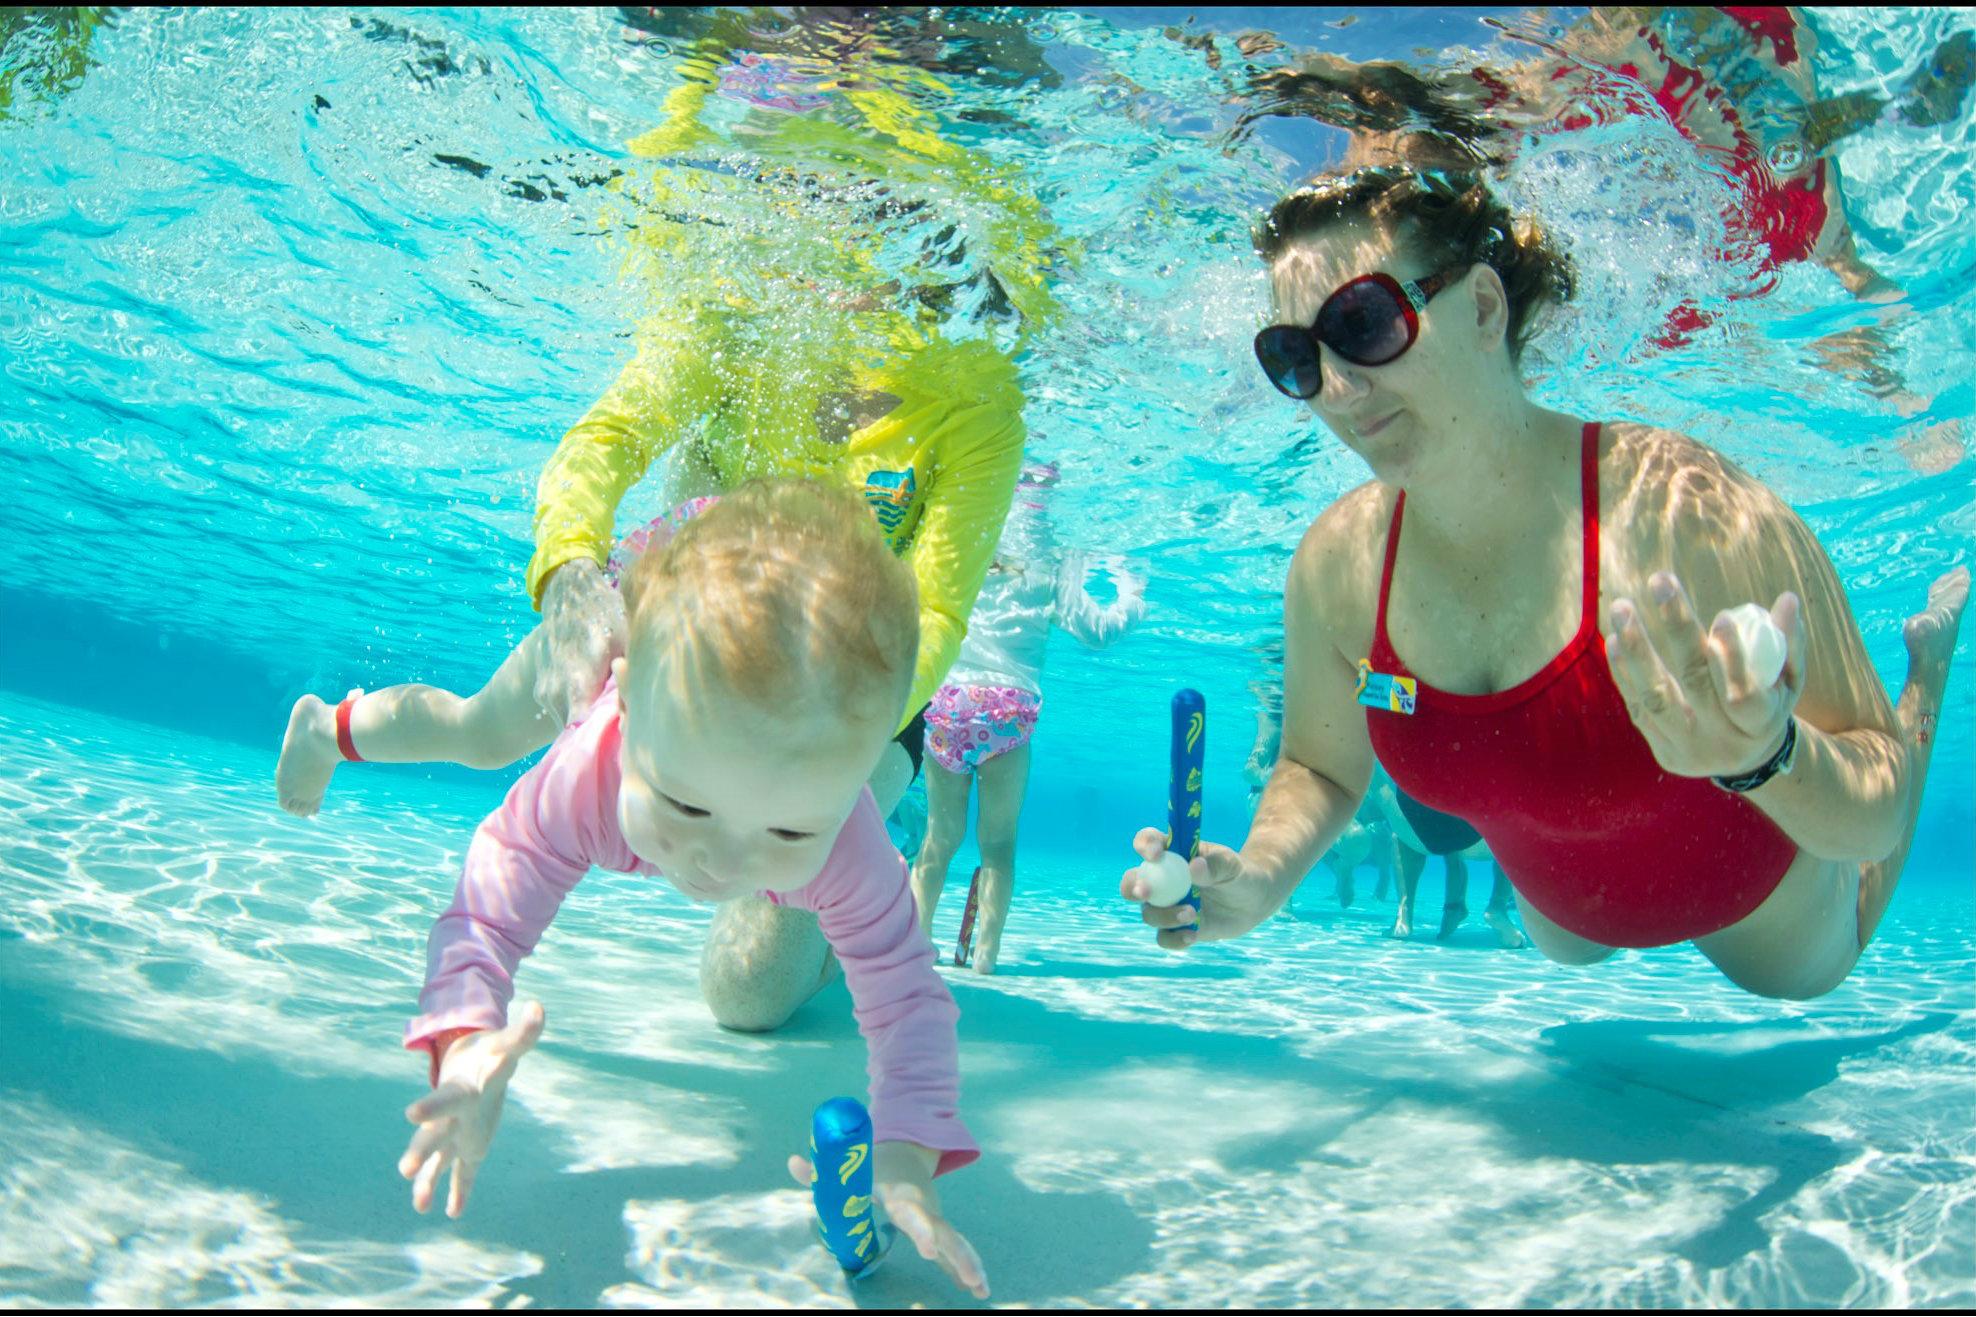 Usa Swimming Reports 5 To 10 Increase In Swimming Ability In U S Children Aquatics